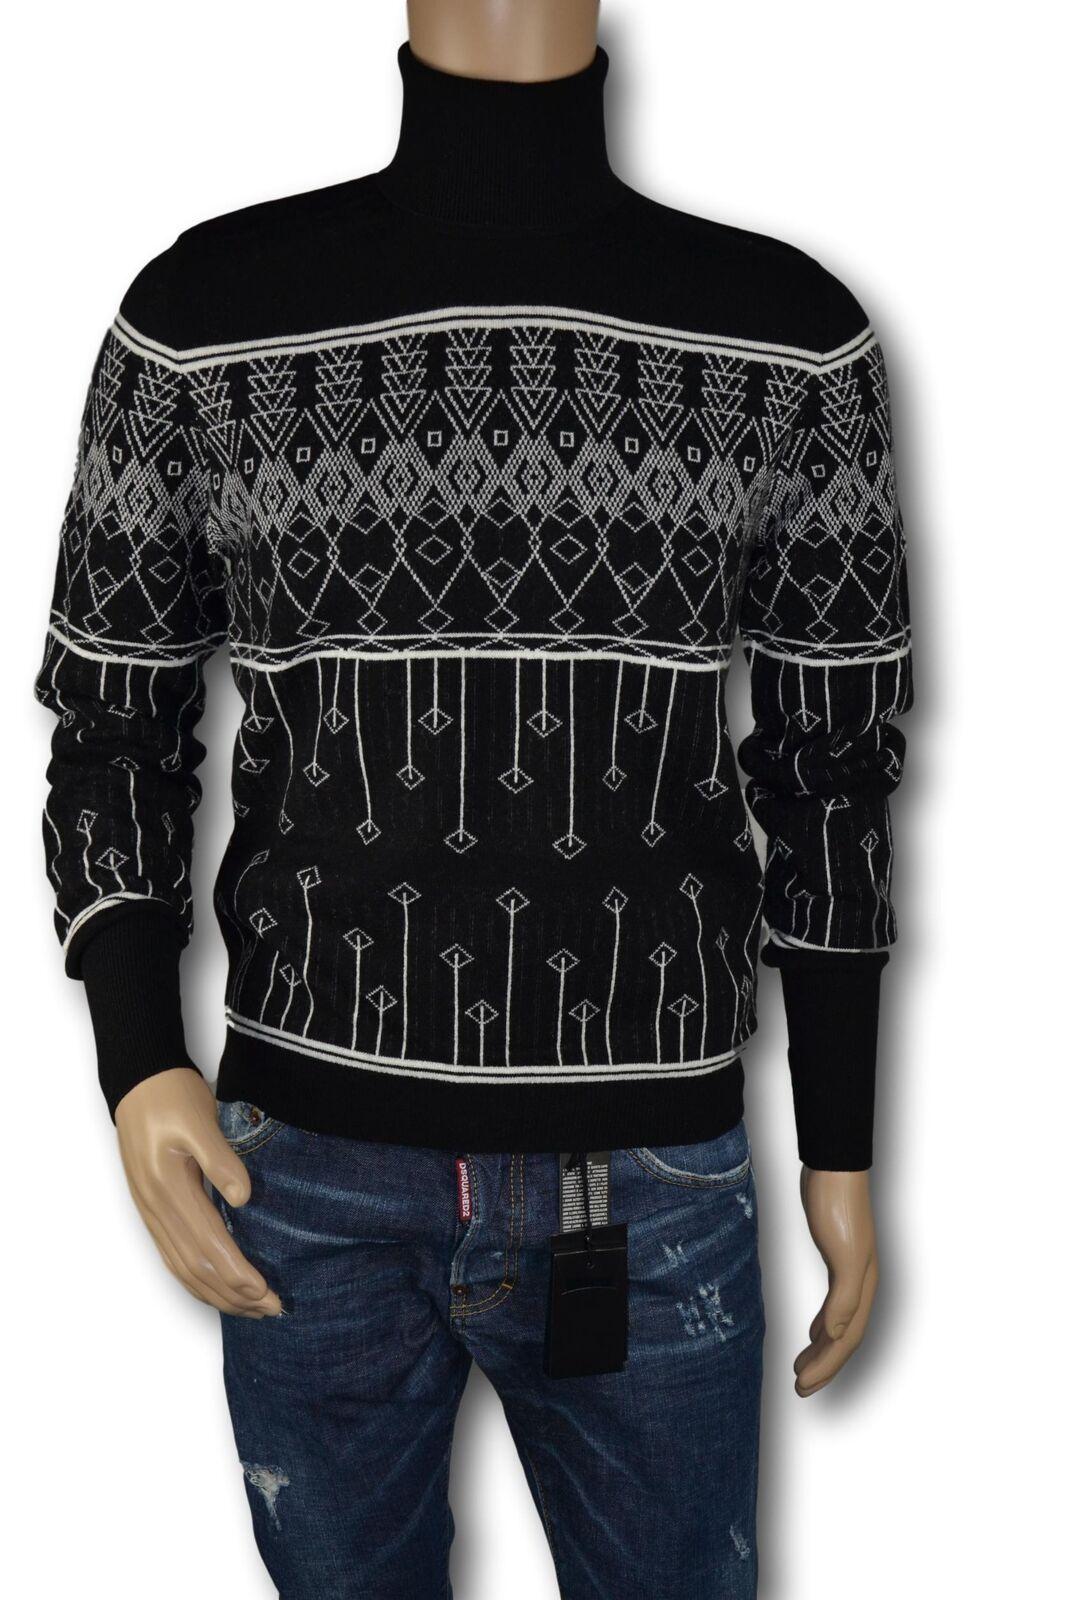 BALLANTYNE Maglione Dolcevita  Herren Man's Sweater Men Jumper Cashmere TG. 50